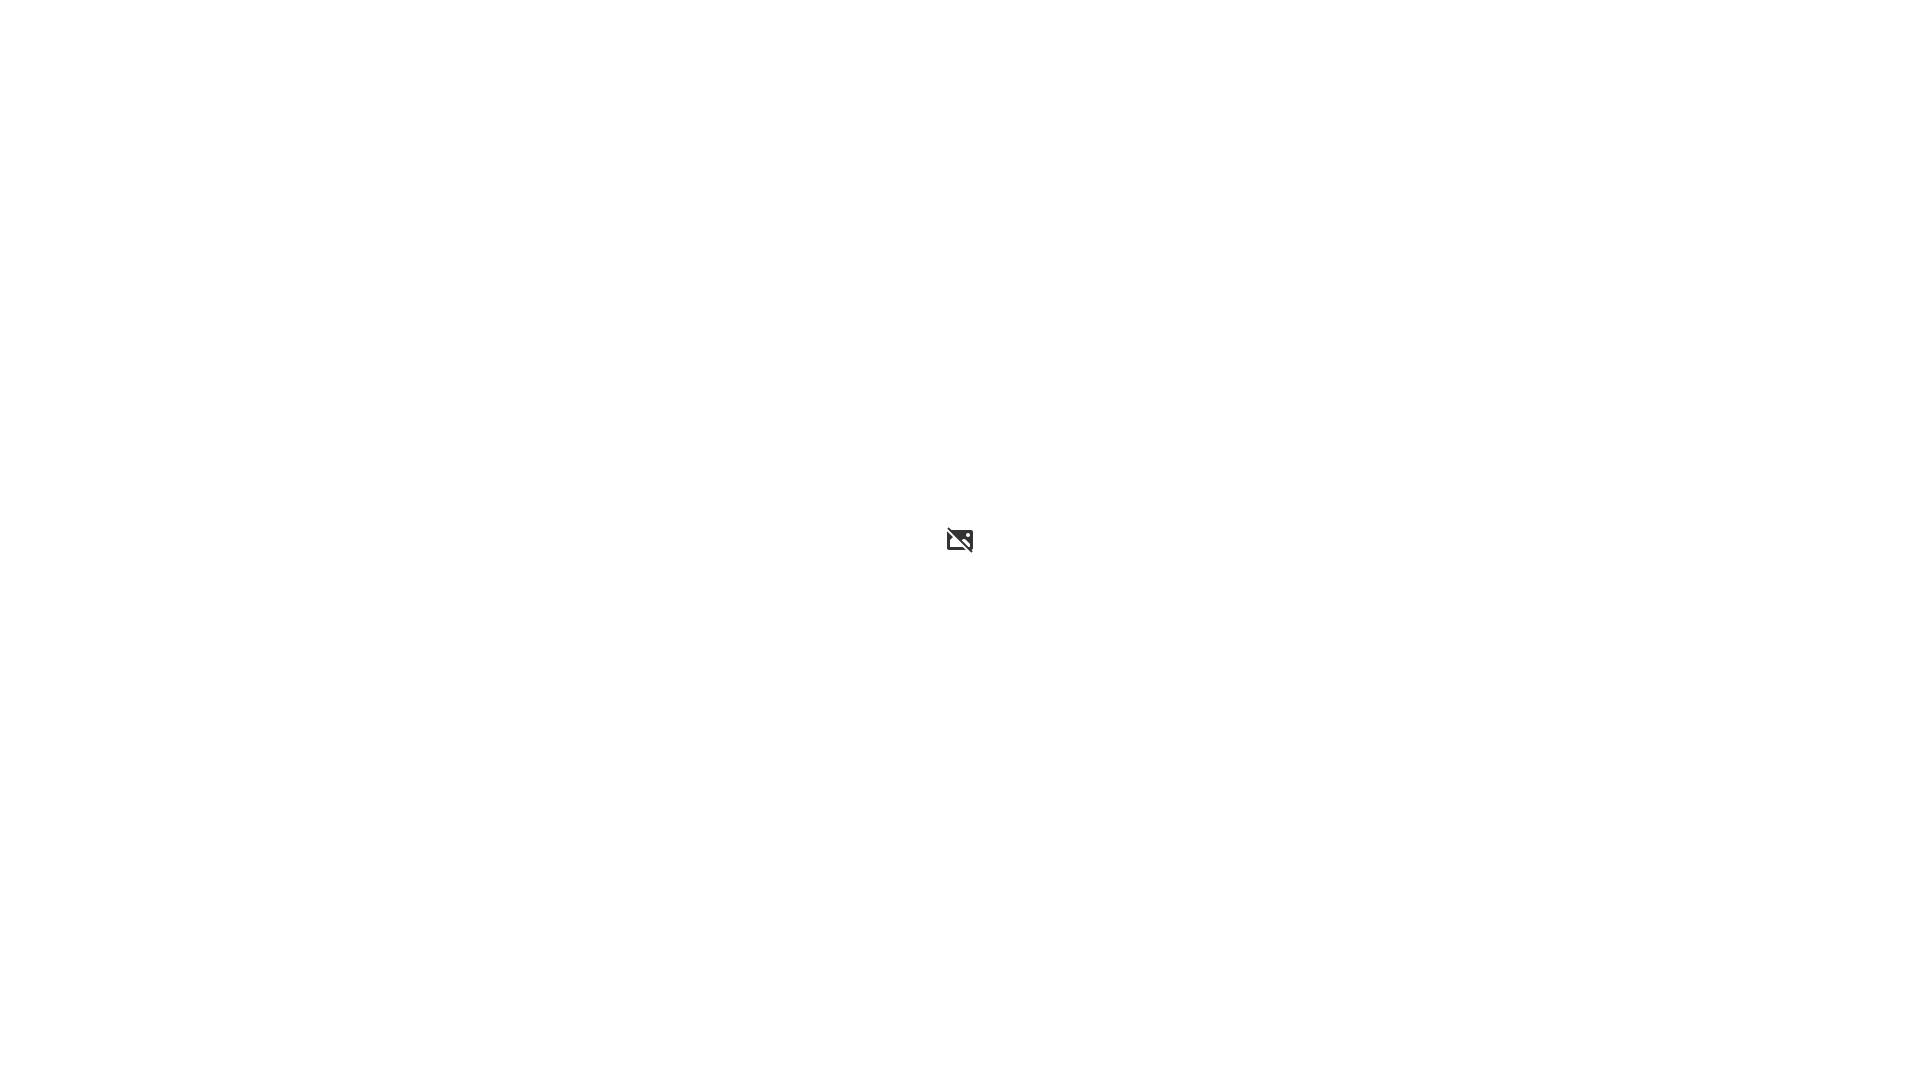 cassiopeia_the_powerful_jade__full_color_jade______by_xxxhkxxx-d7q0oxx